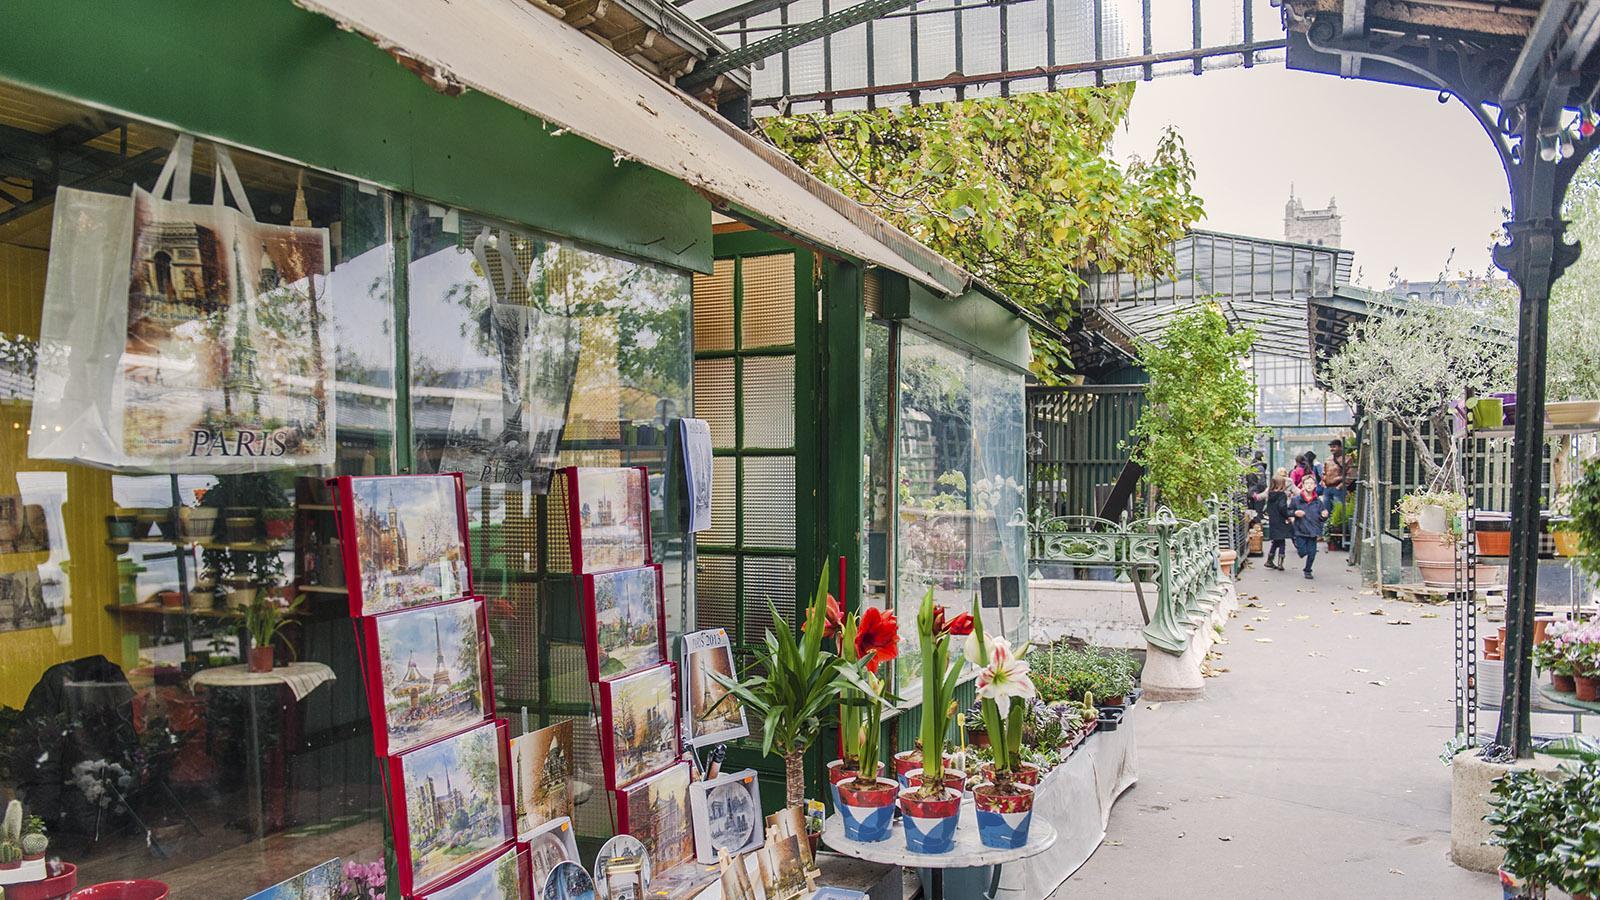 Märkte: Der Blumenmarkt der Île de la Cité. Foto: Hilke Maunder